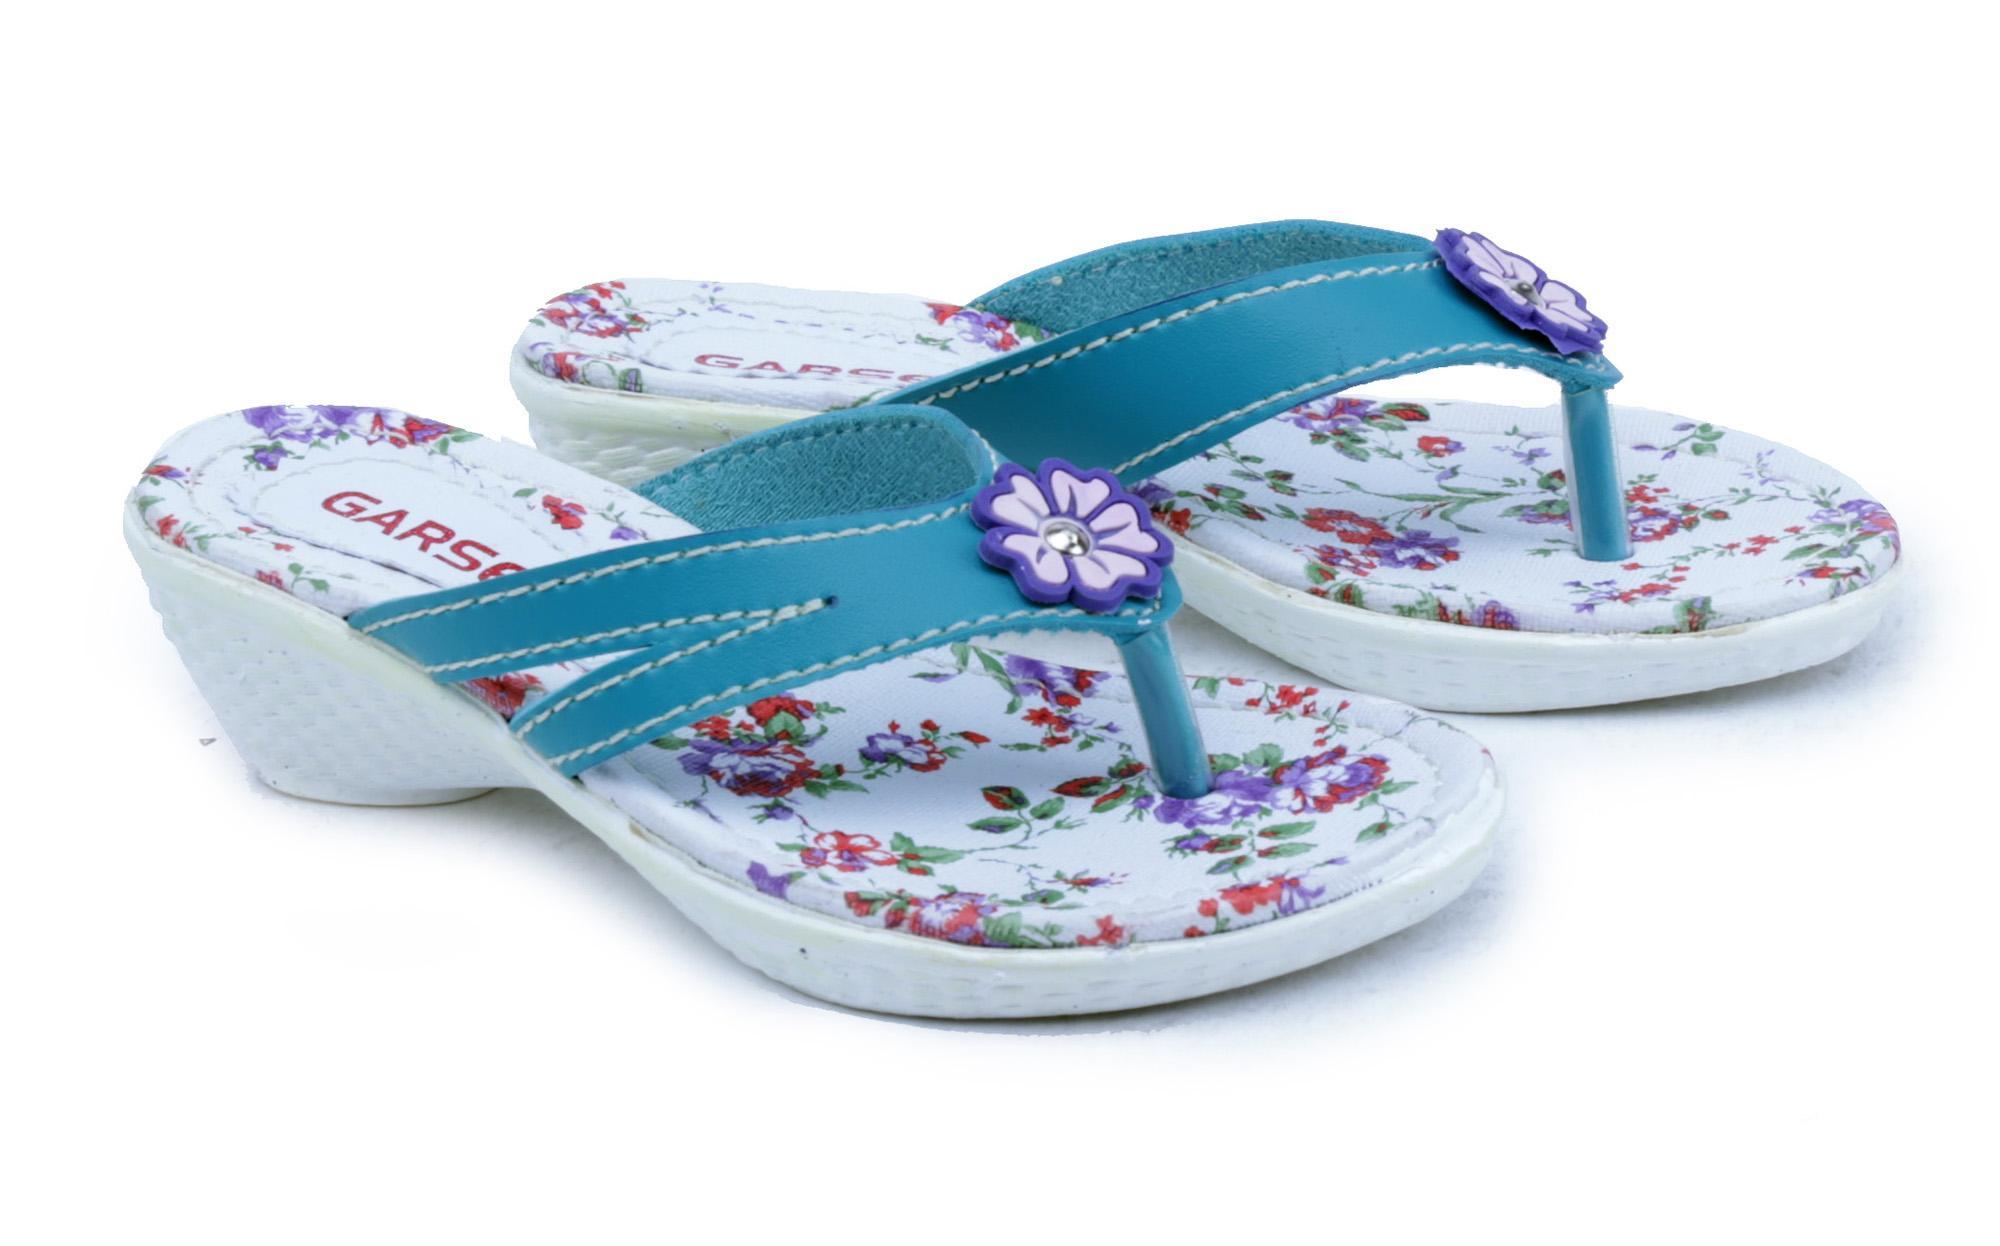 Garsel Shoes GUJ 9013 Sandal Anak Casual Perempuan-Sintetis-Tpr-New Katalog Lucu Bagus(Tosca)